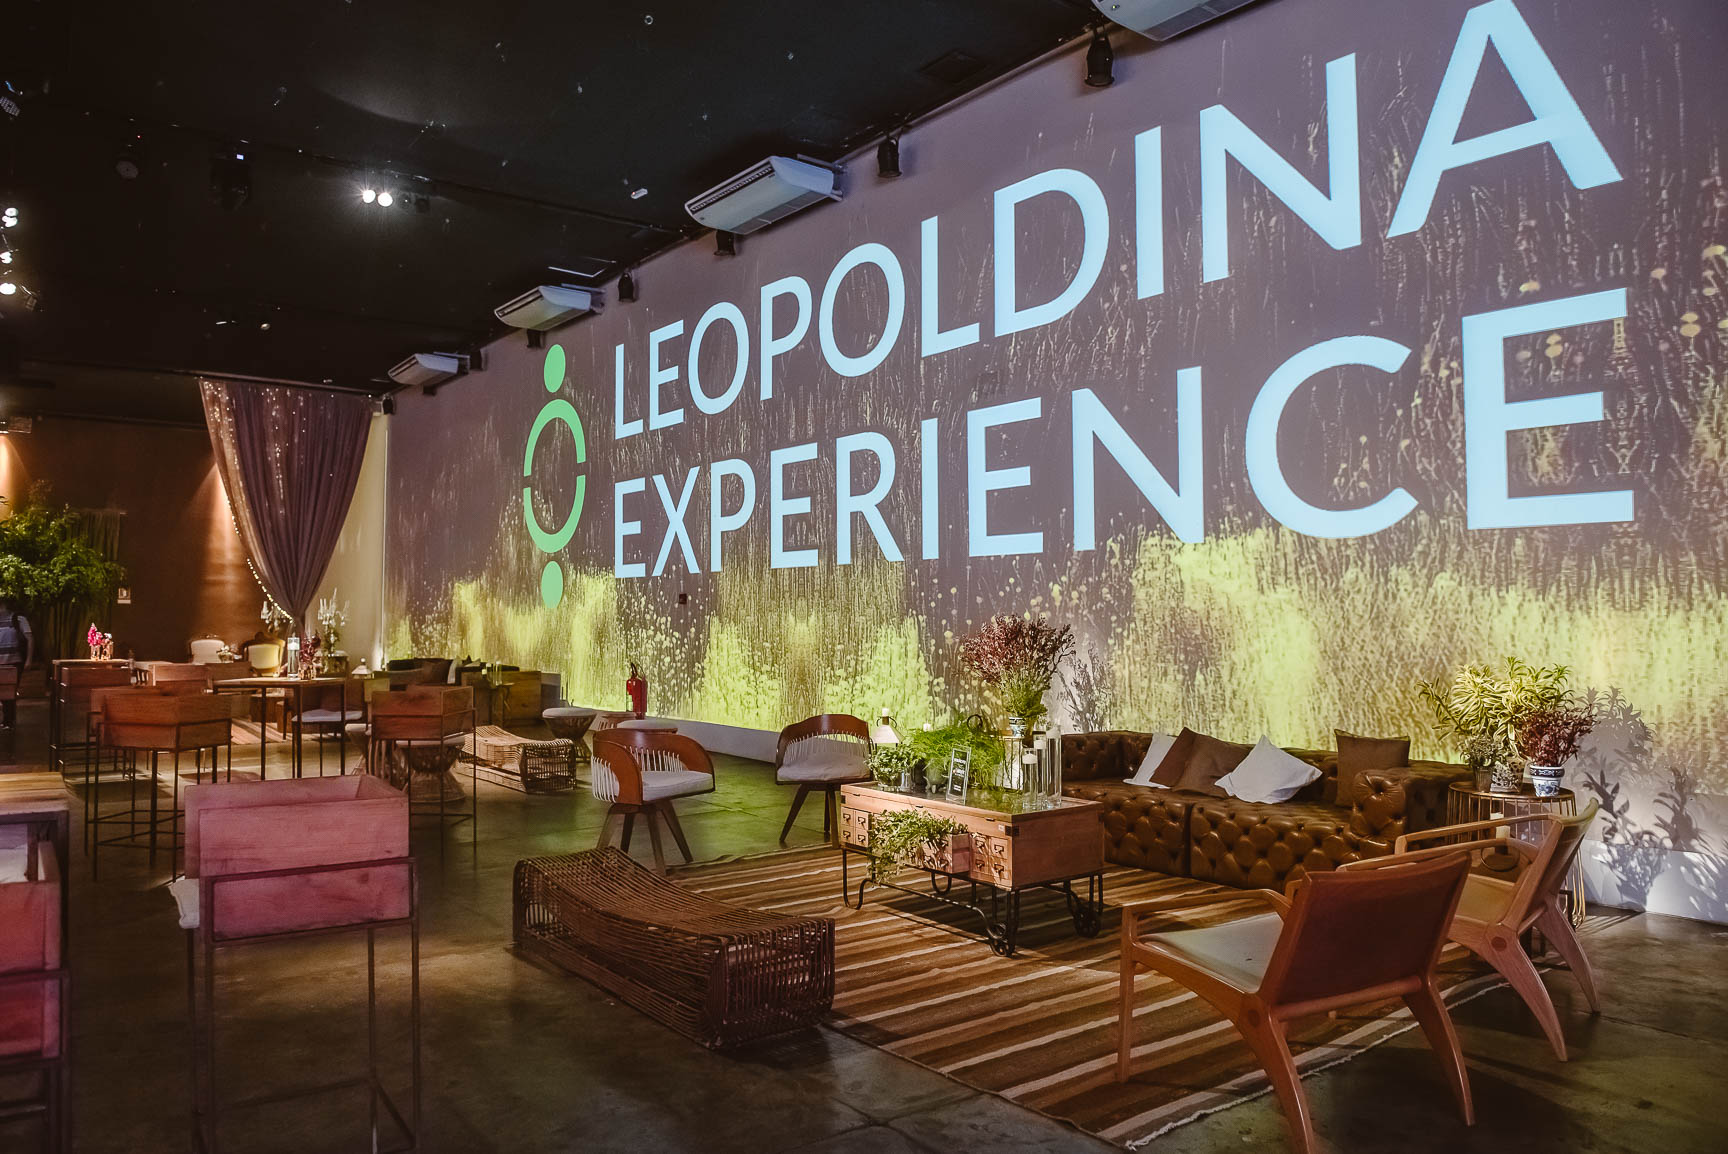 Leopoldina Experience: incrivelmente novo